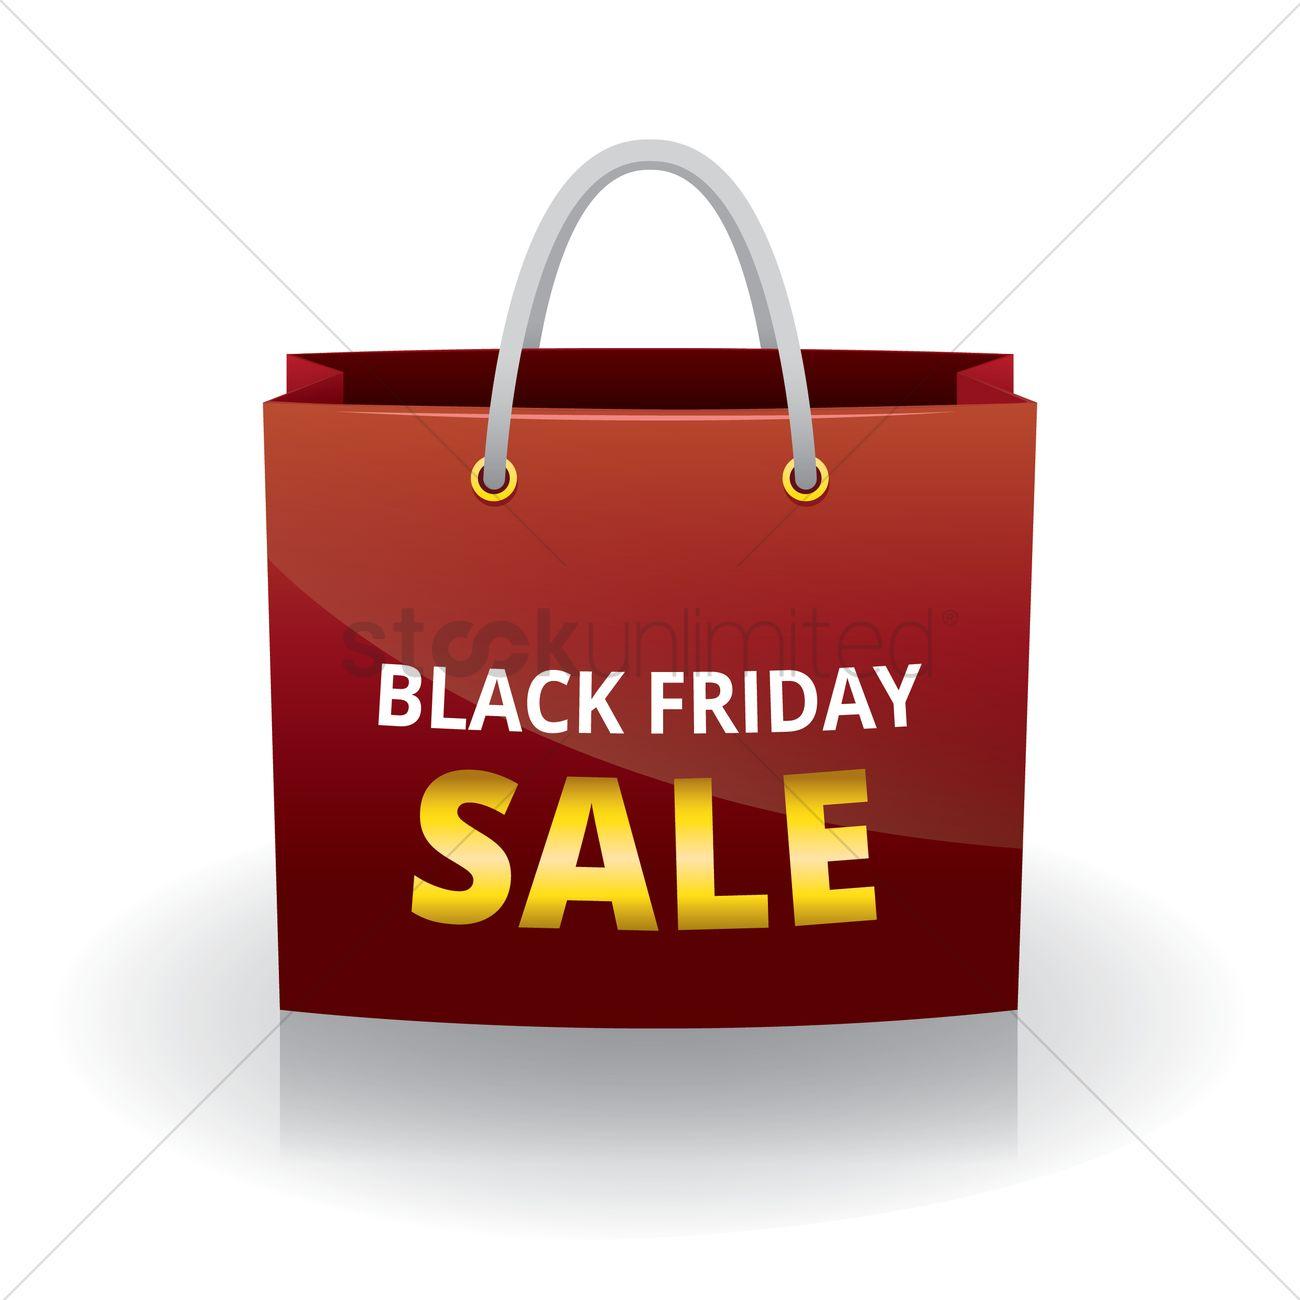 Black friday shopping bag Vector Image - 1603881 | StockUnlimited